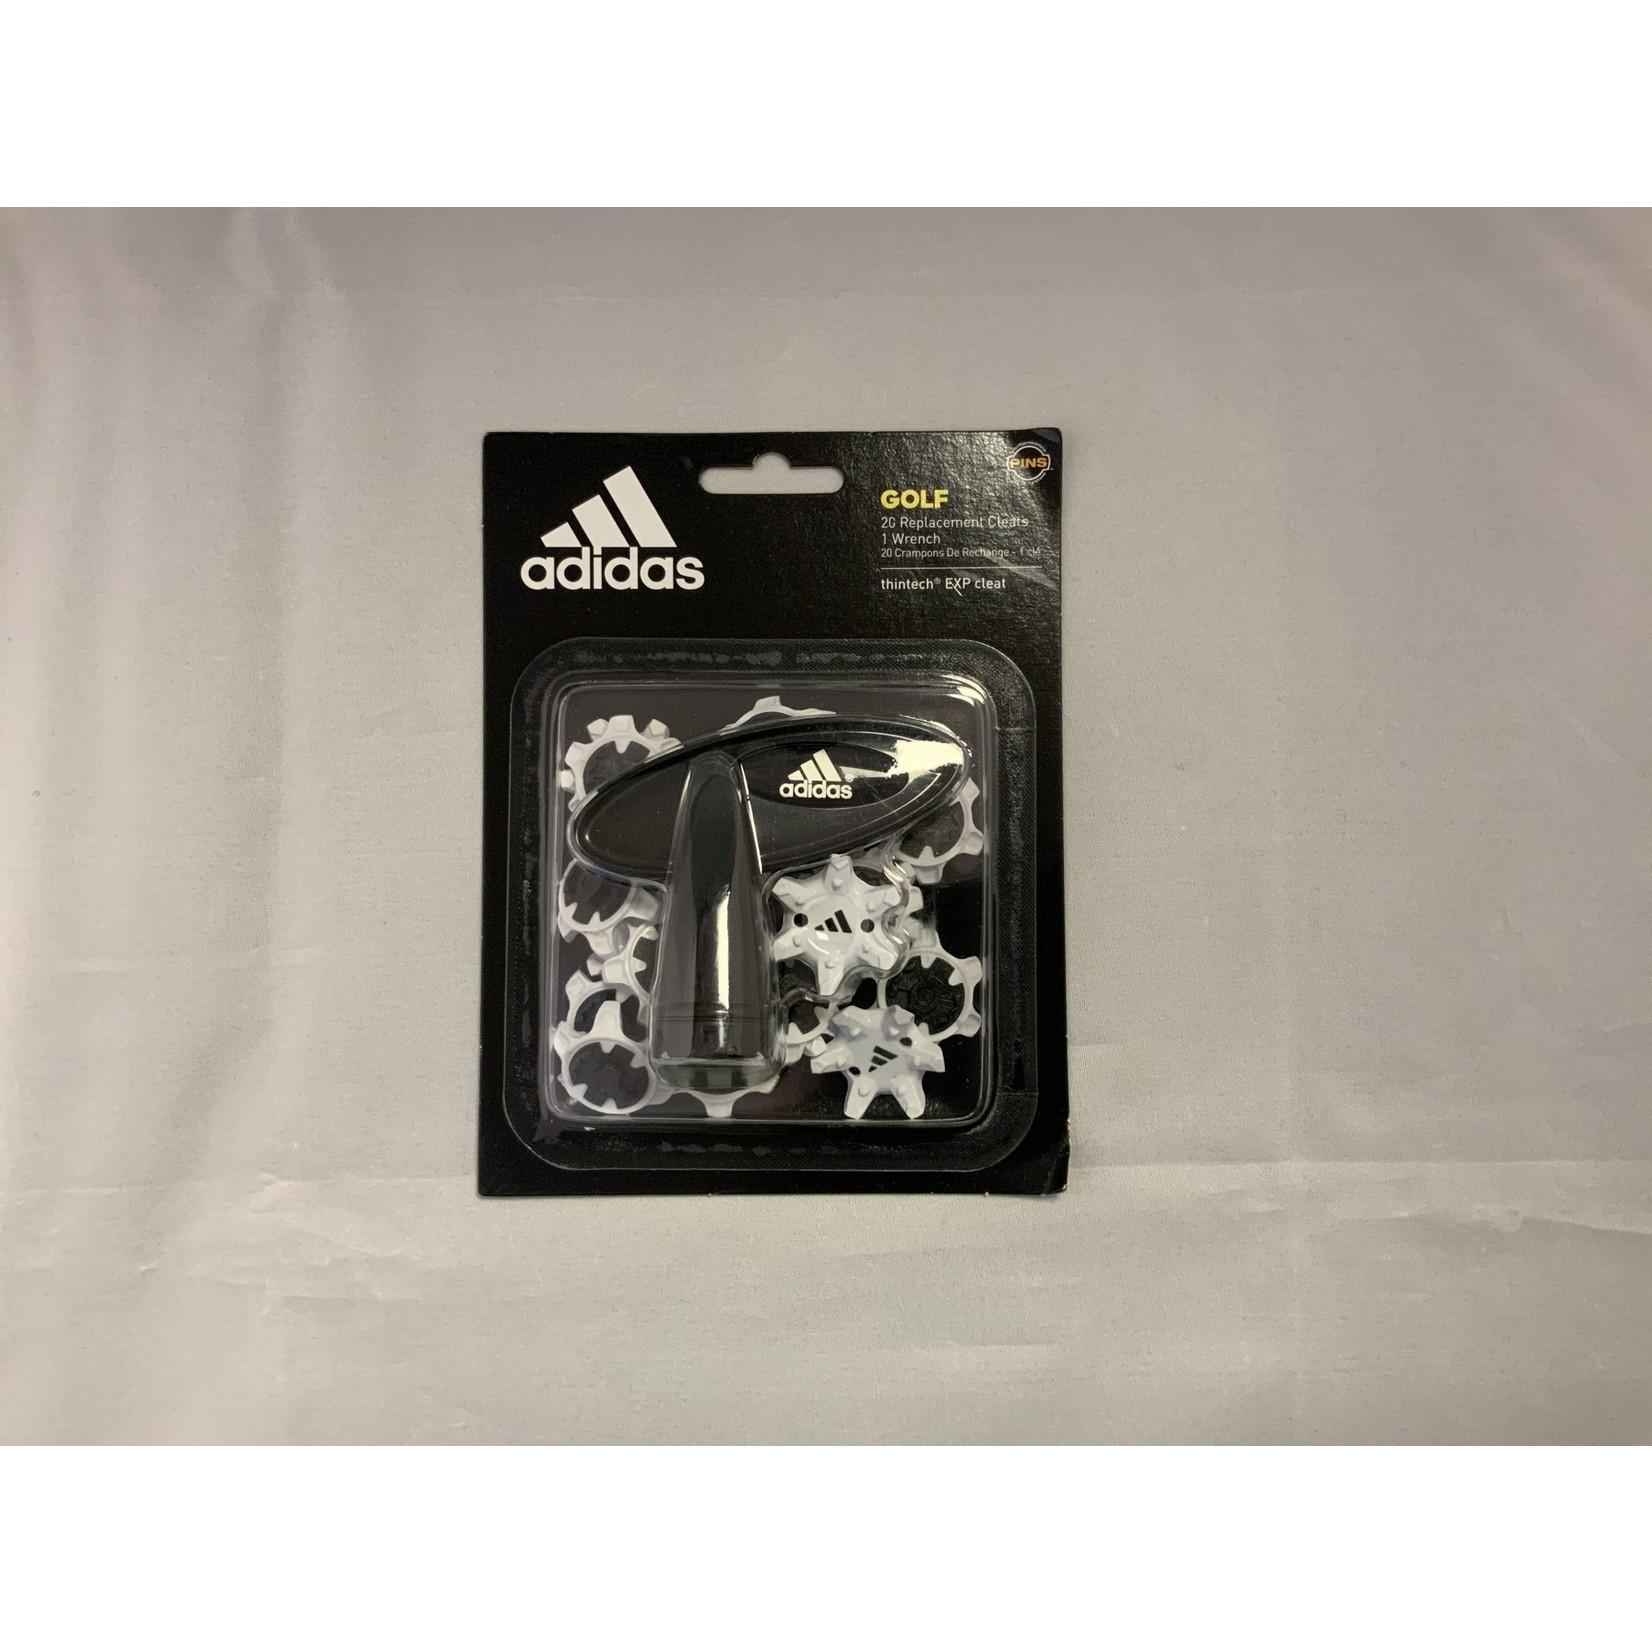 Adidas Adidas Softspikes PINS White